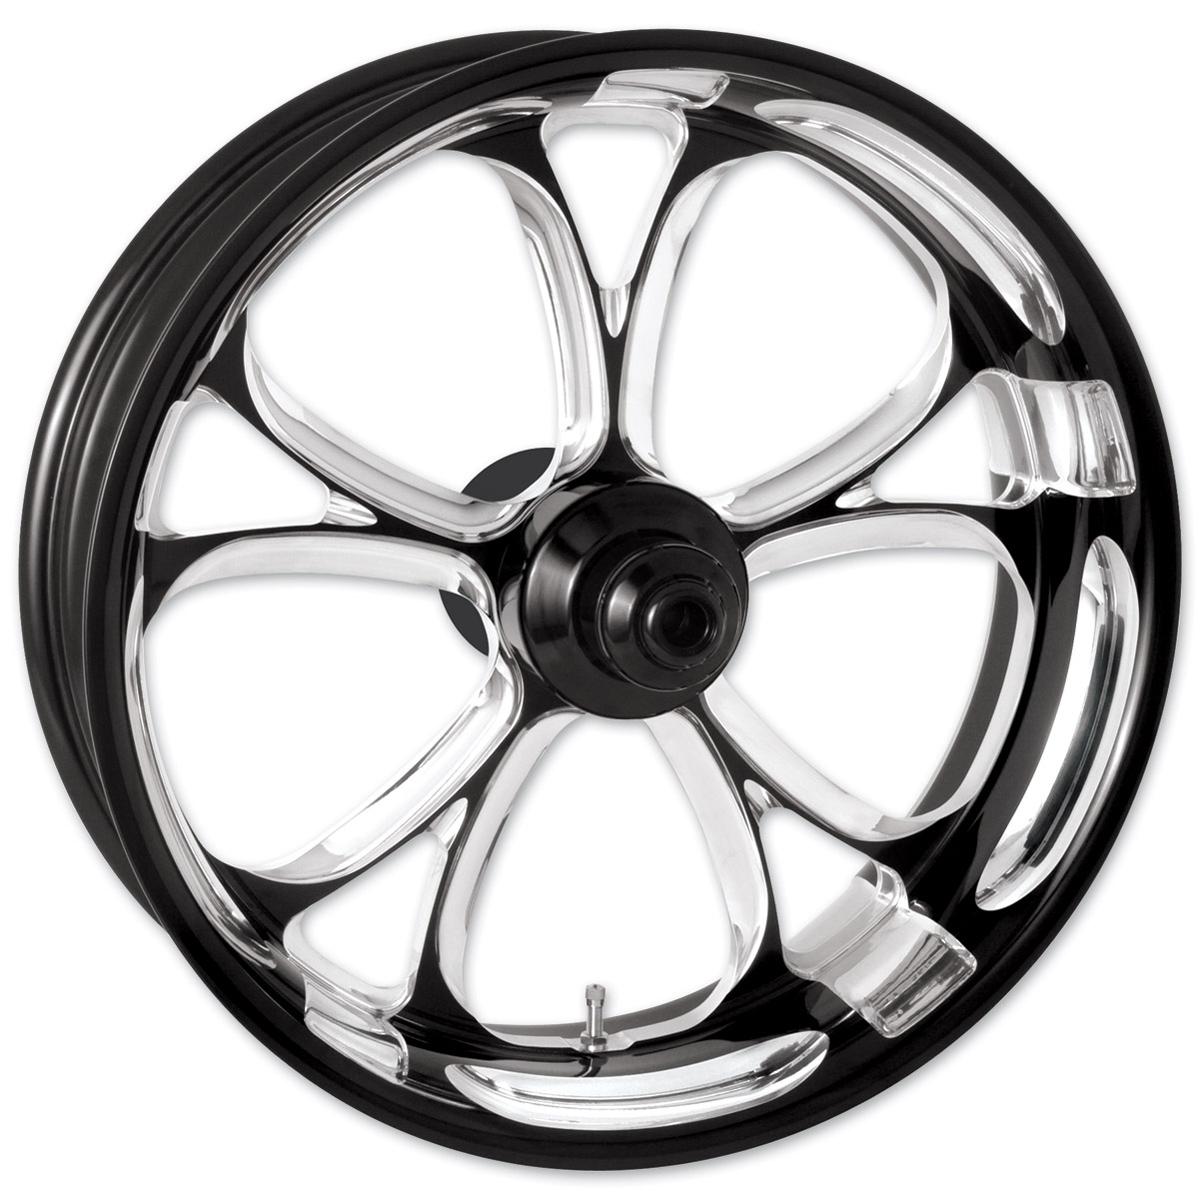 Performance Machine Luxe Platinum Cut Front Wheel 21x2.15 Non-ABS